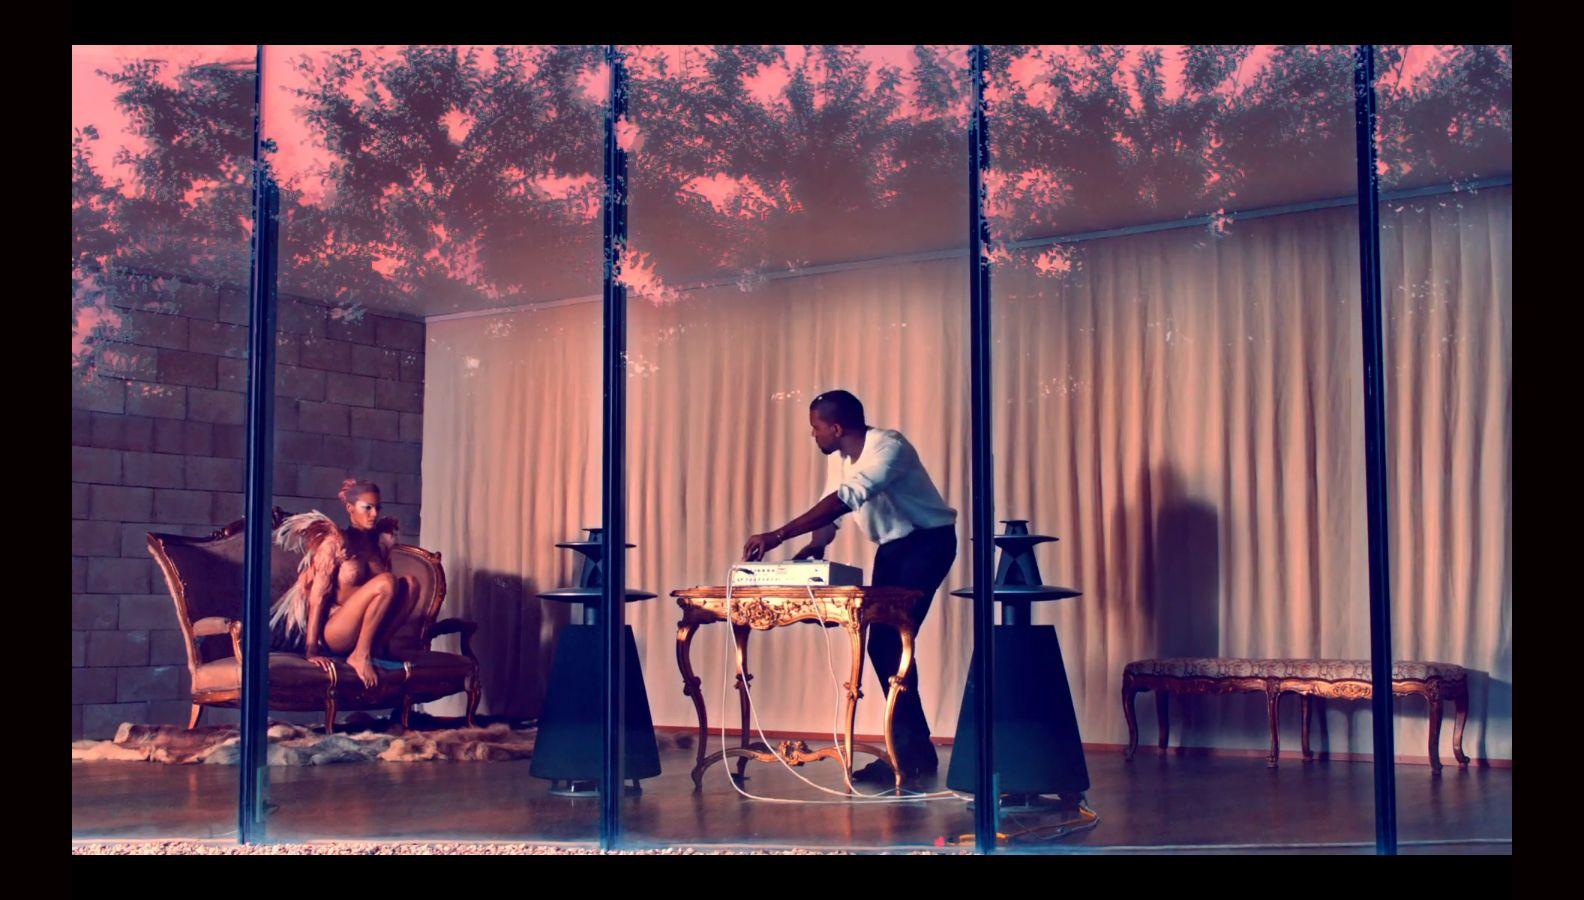 Examining Cinematography Film Runaway By Kanye West Kanye West Beautiful Dark Twisted Fantasy Dark And Twisted